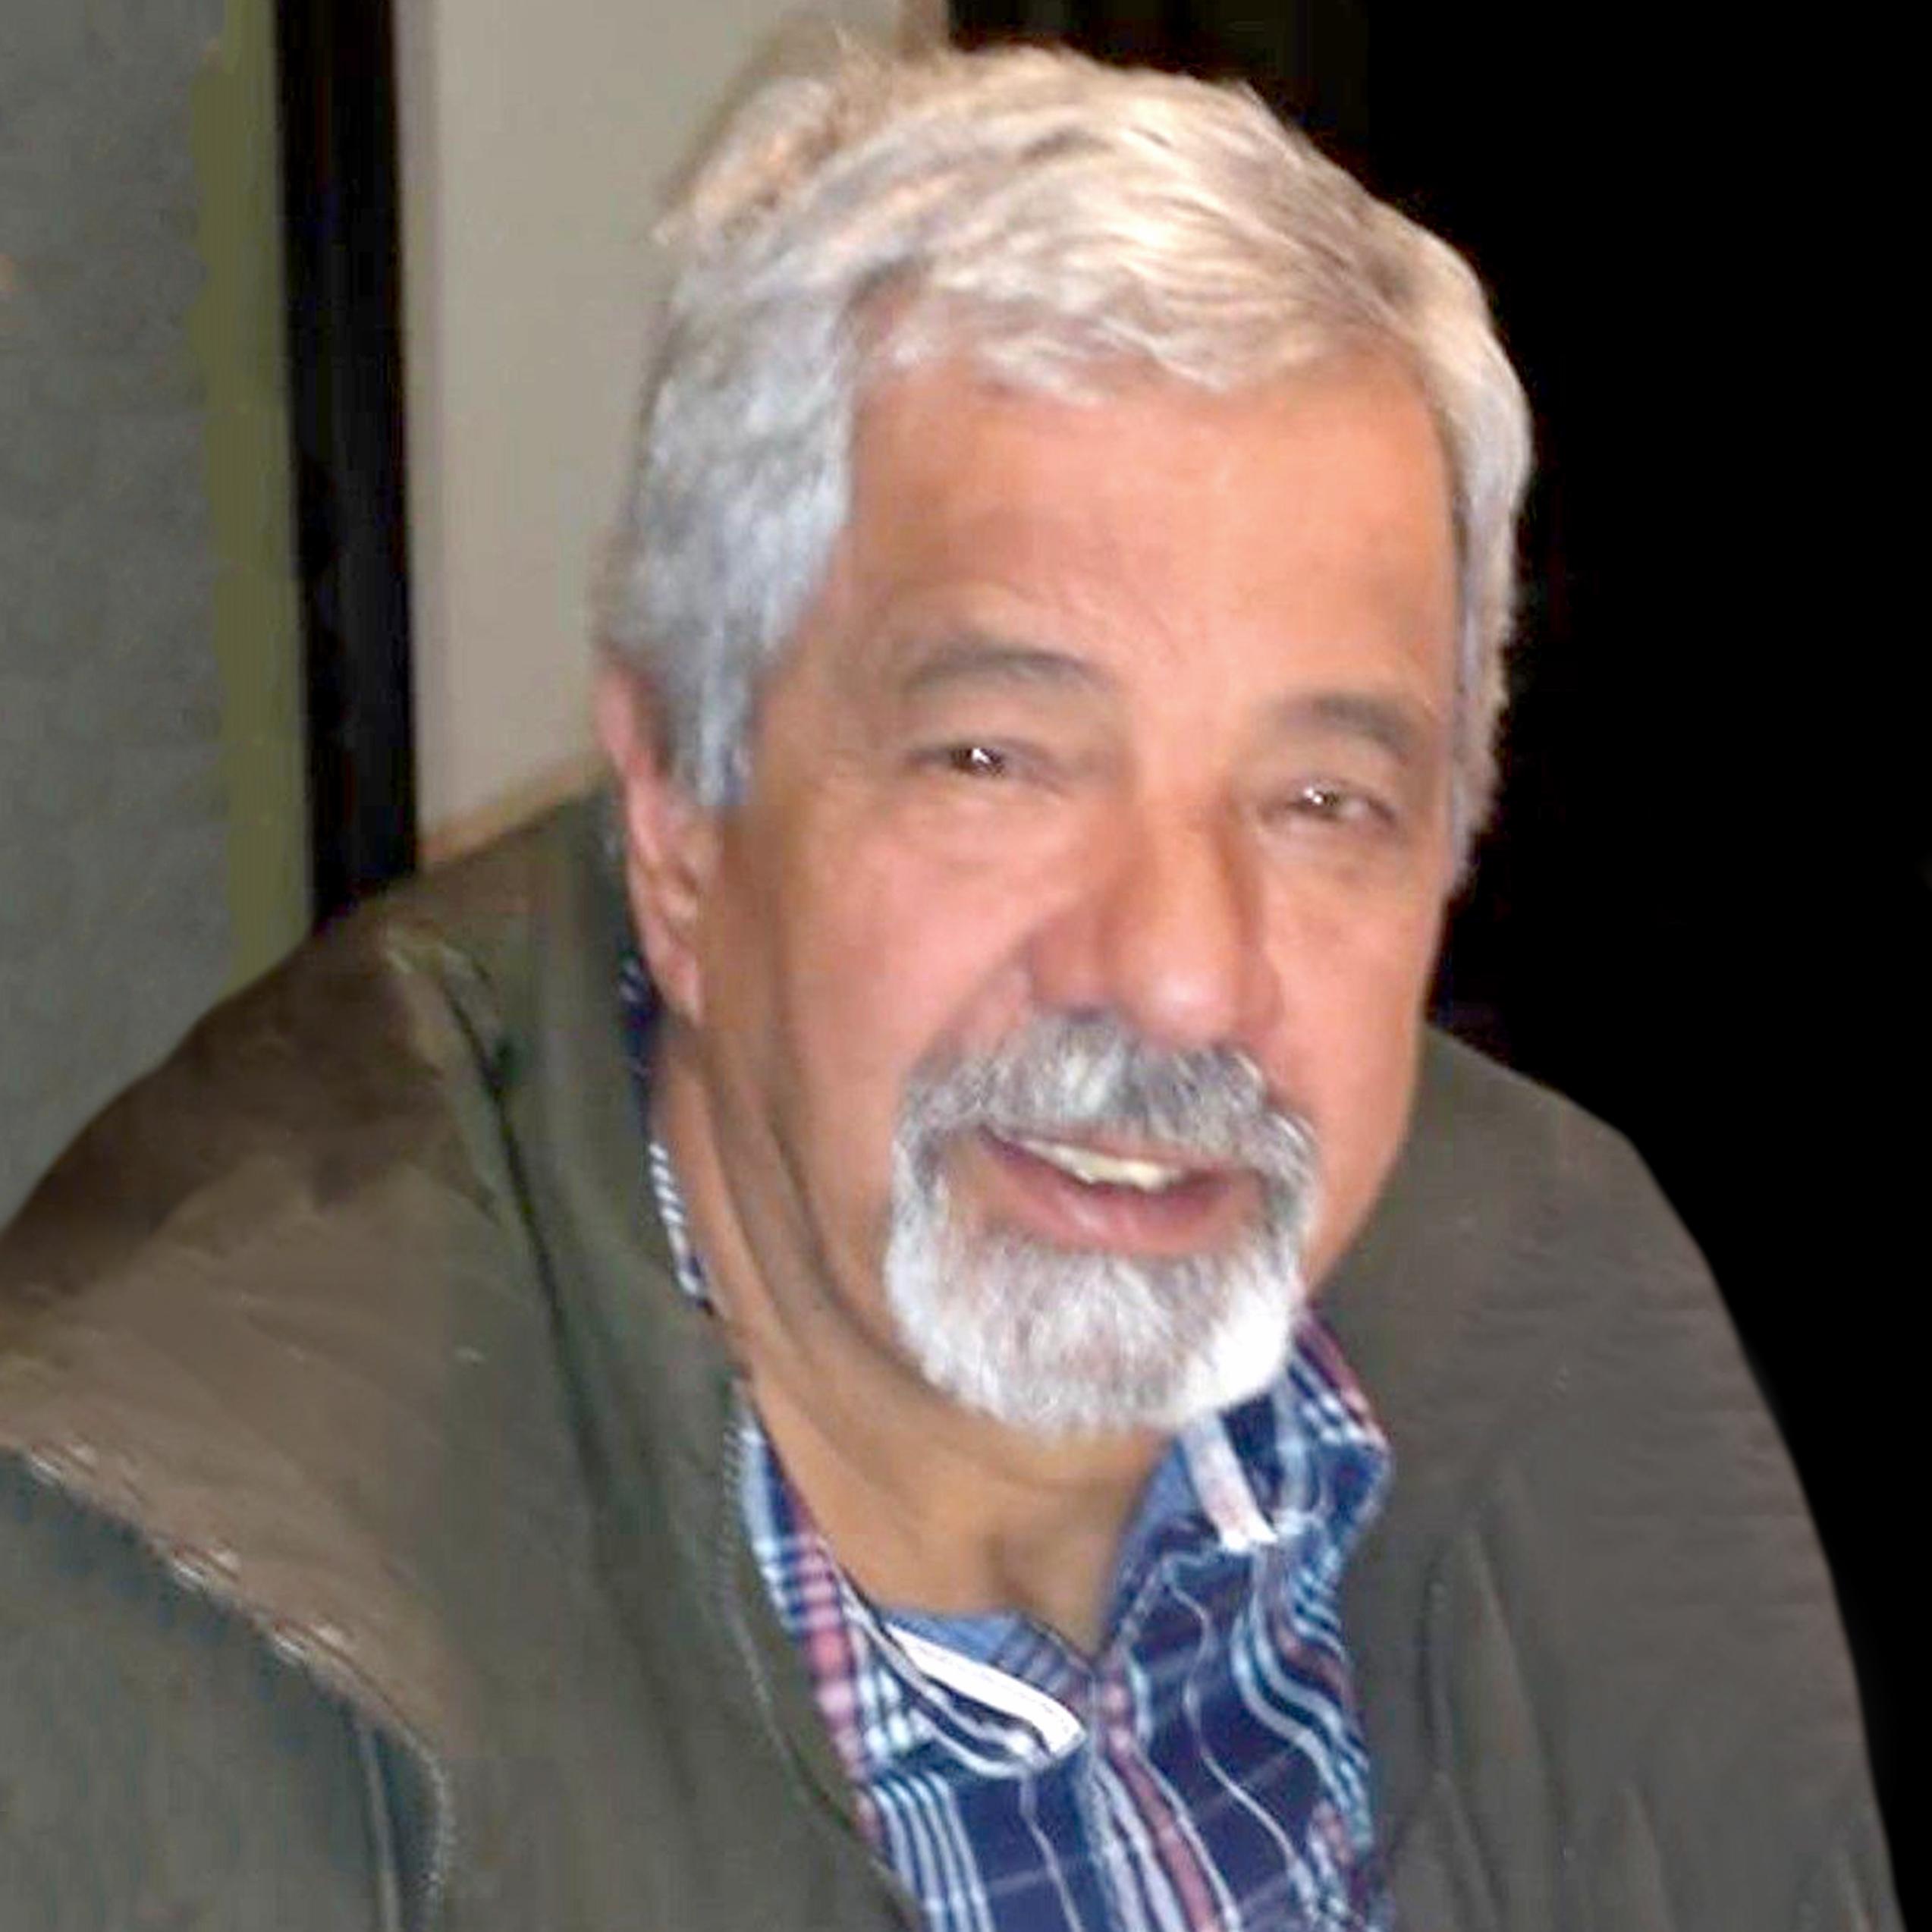 Dimitrios Houliaras